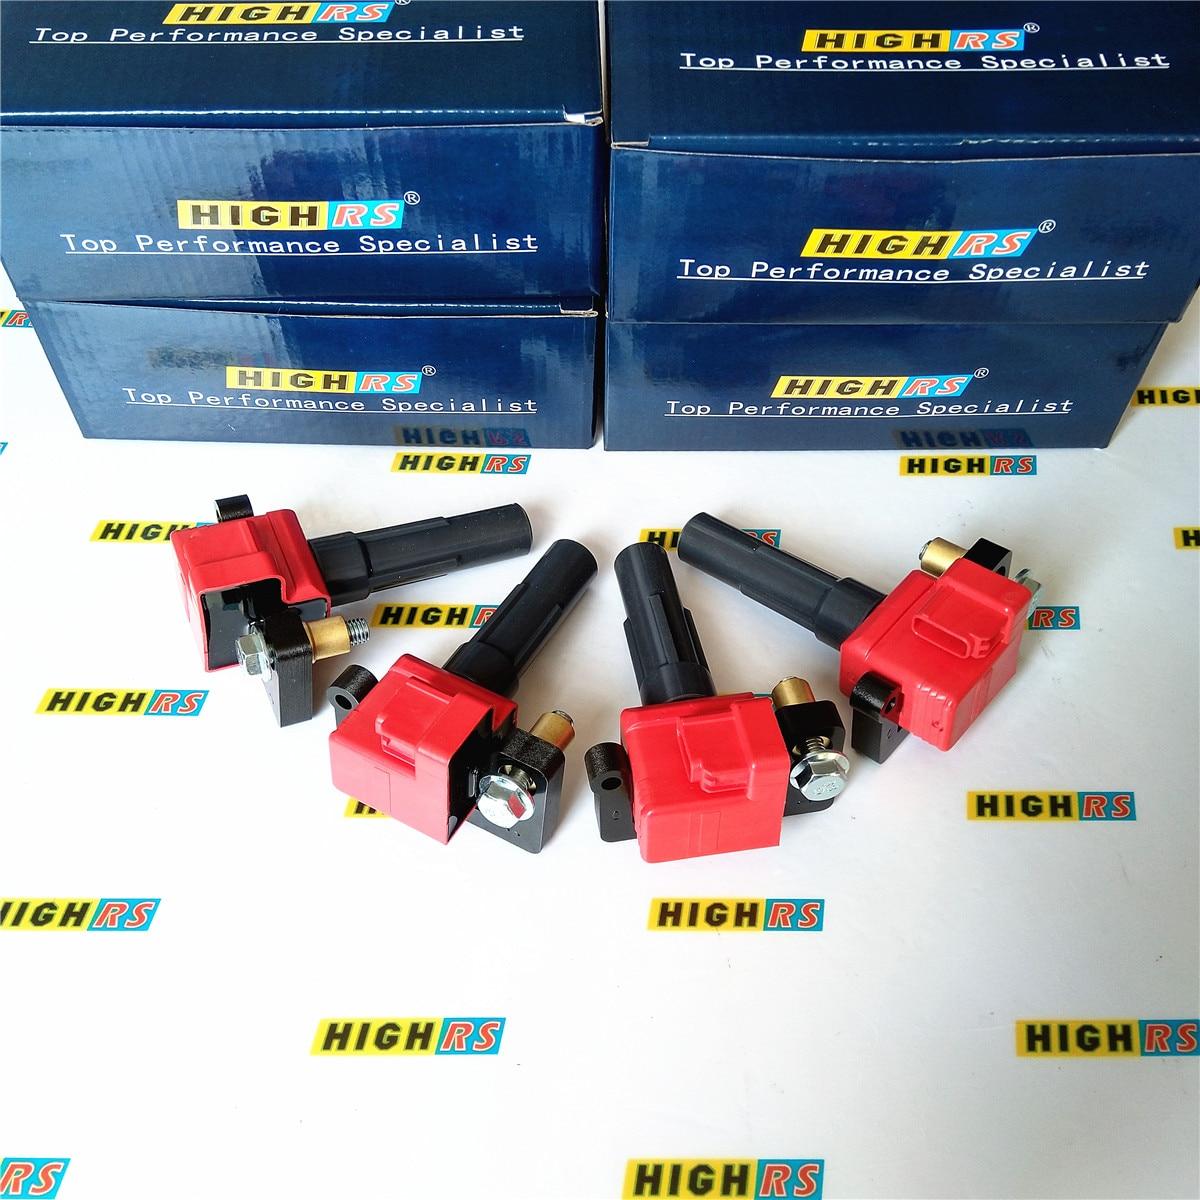 OEM Quality Ignition Coil 2PCS Pack for 2002-2003 Subaru Impreza WRX 2.0L H4